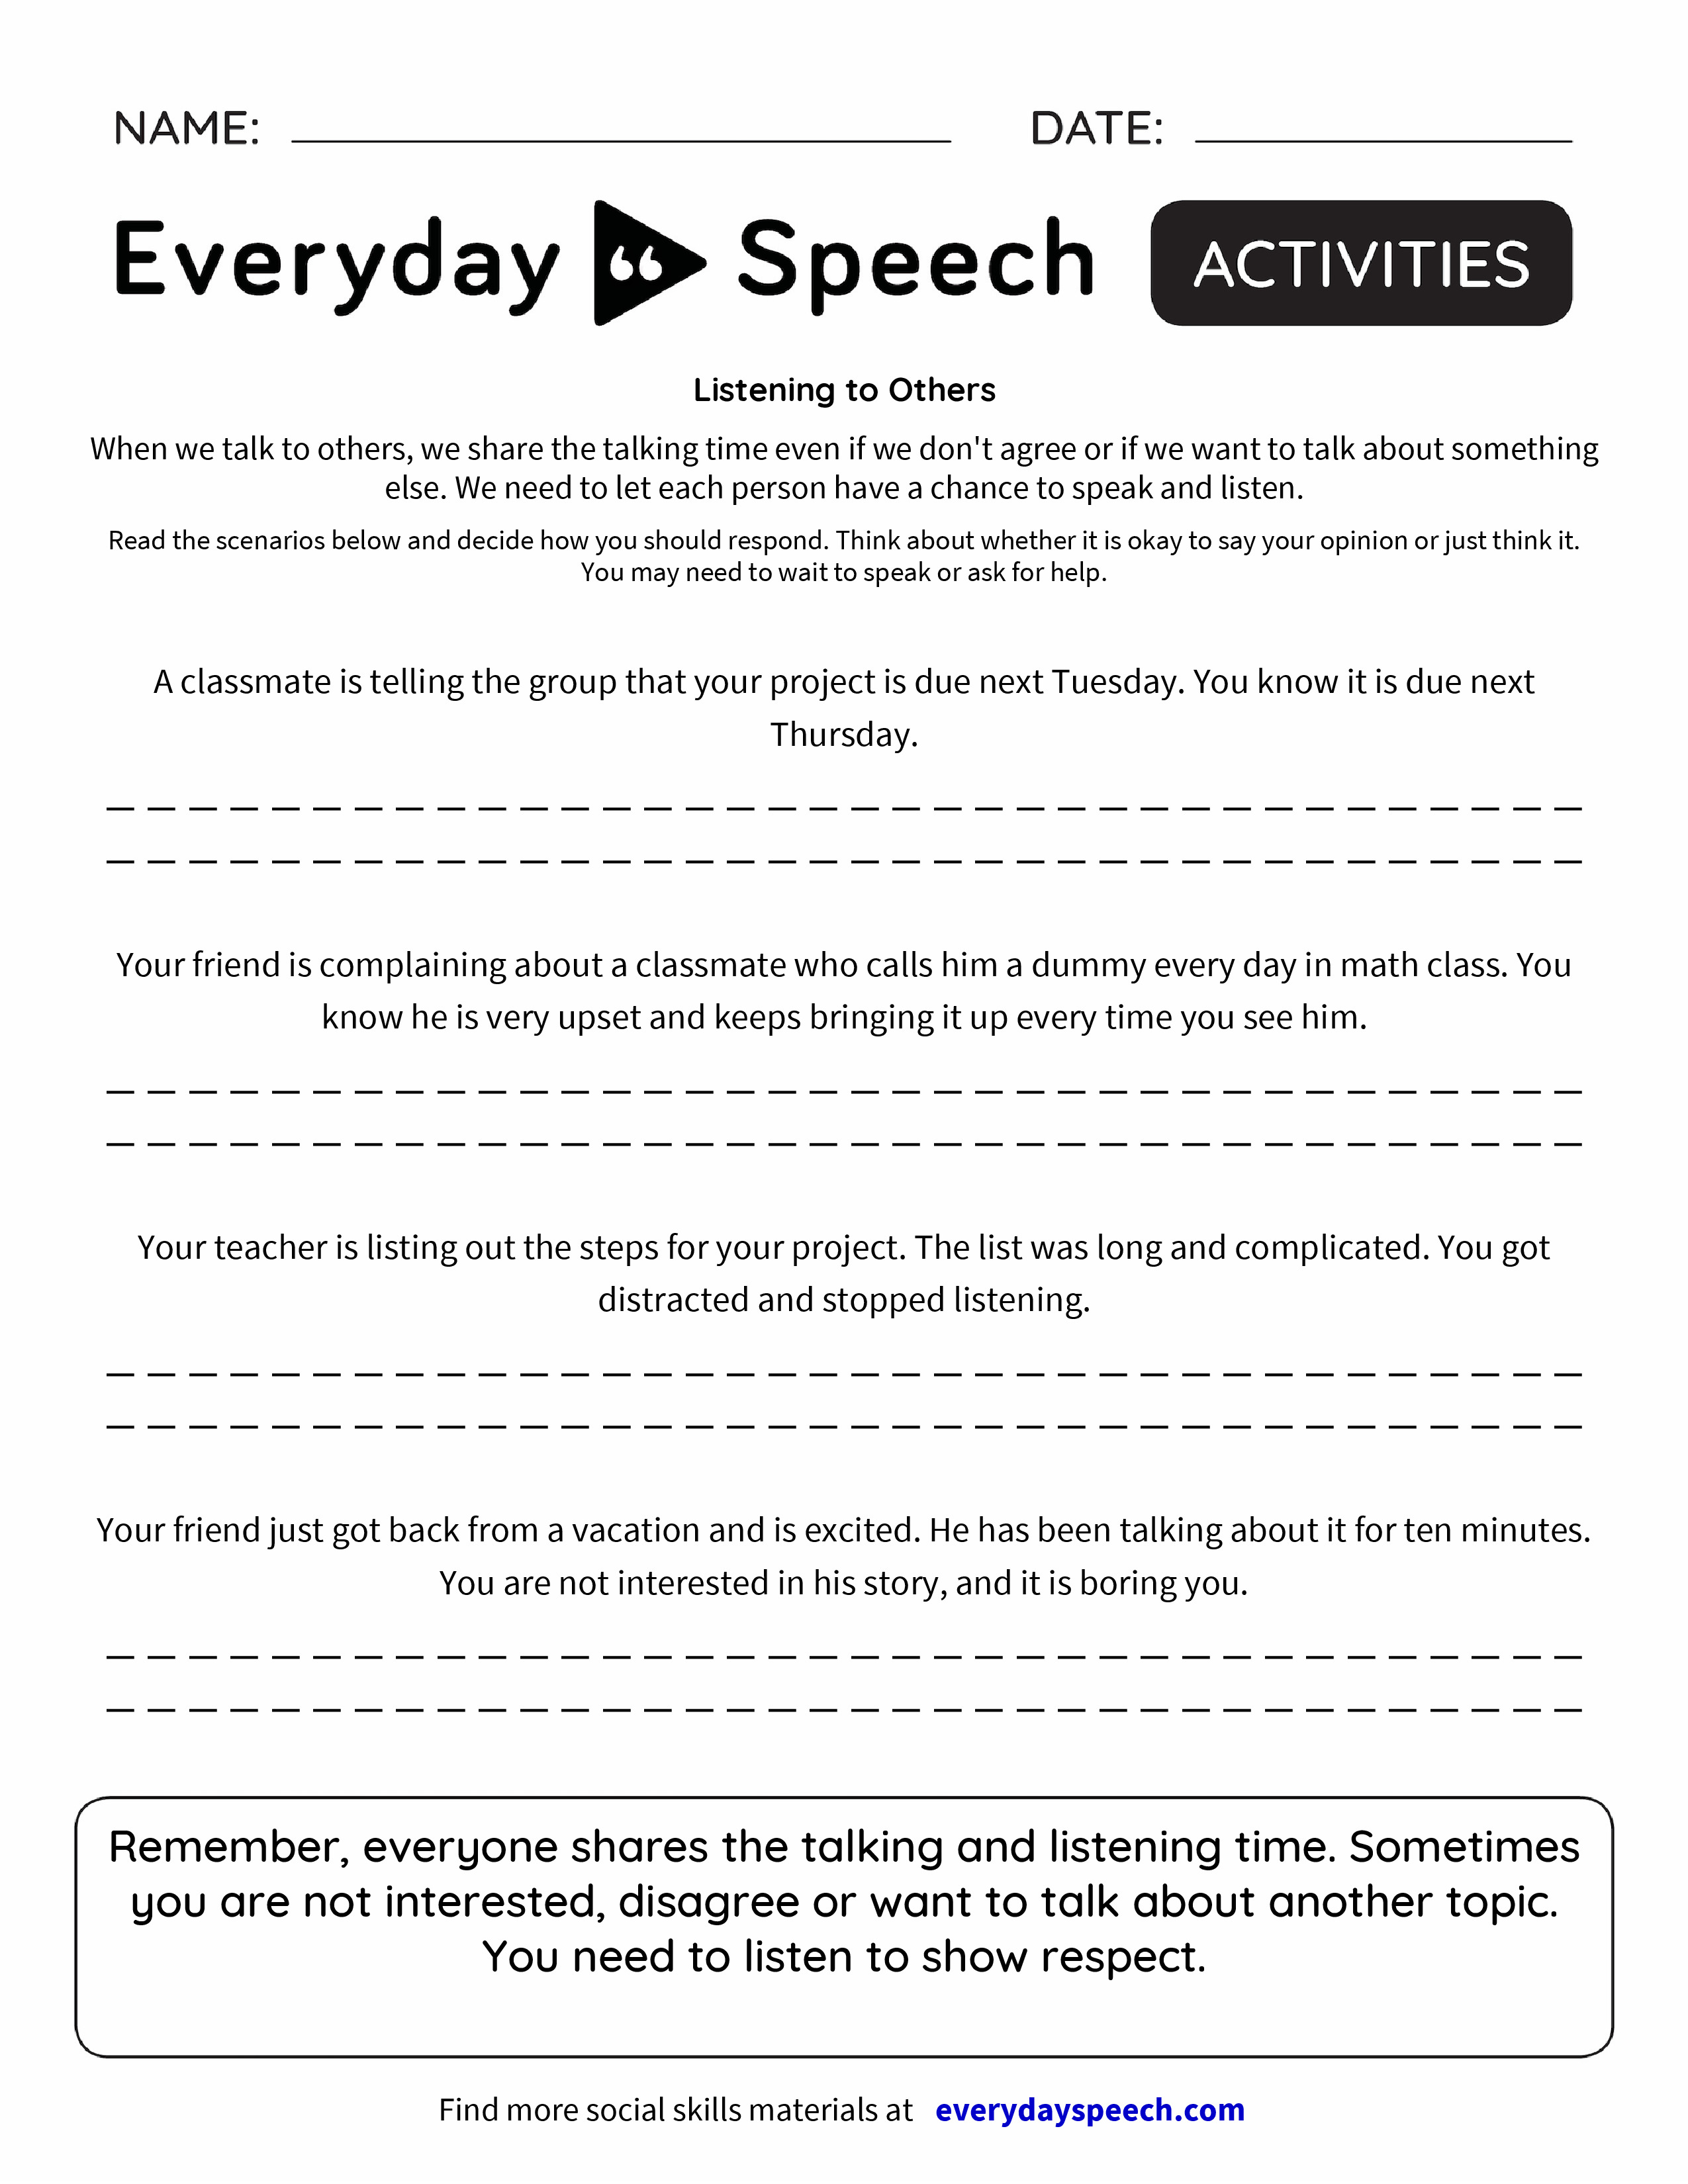 Listening To Others Slp Everyday Speech Everyday Speech